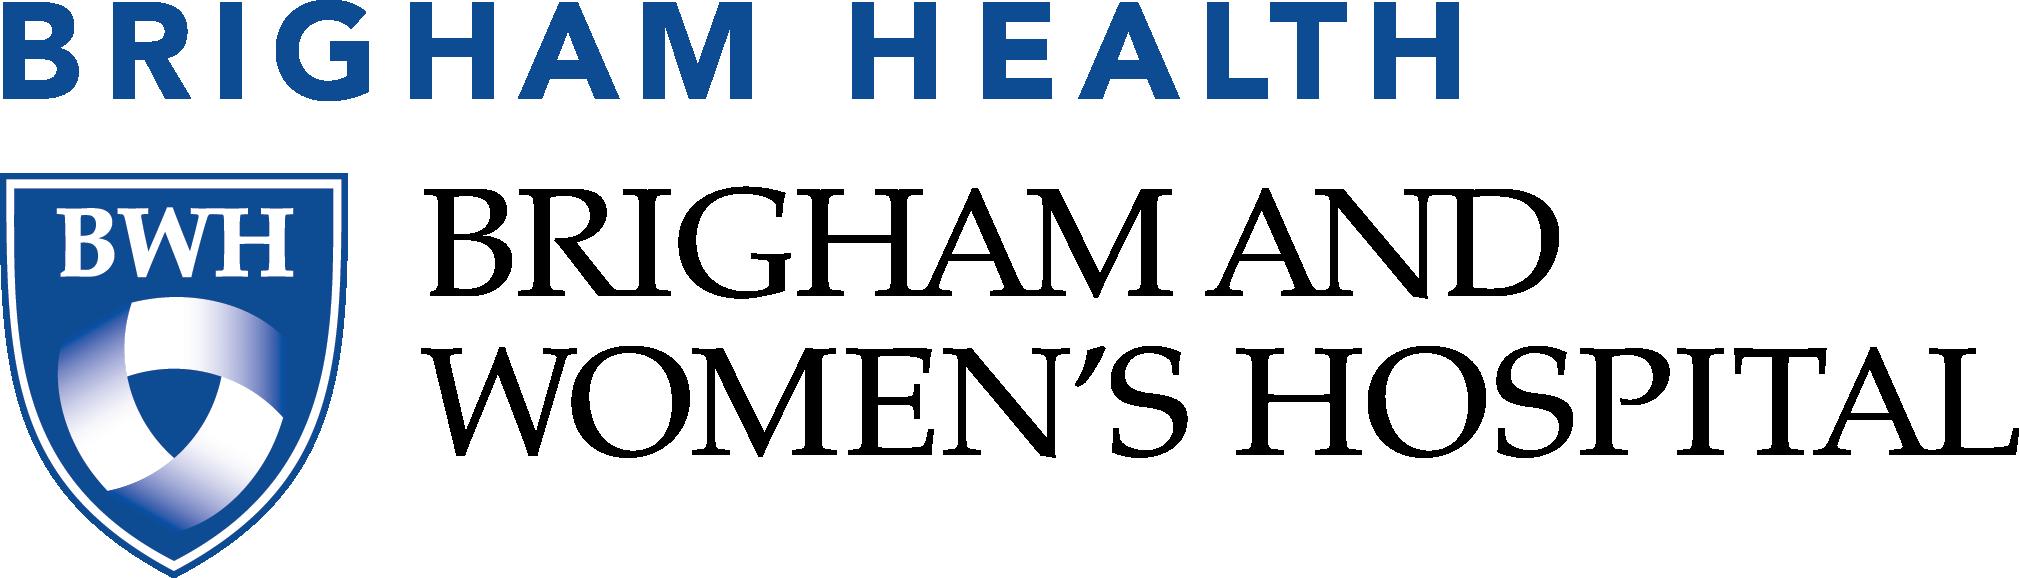 Brigham and Women's Hospital